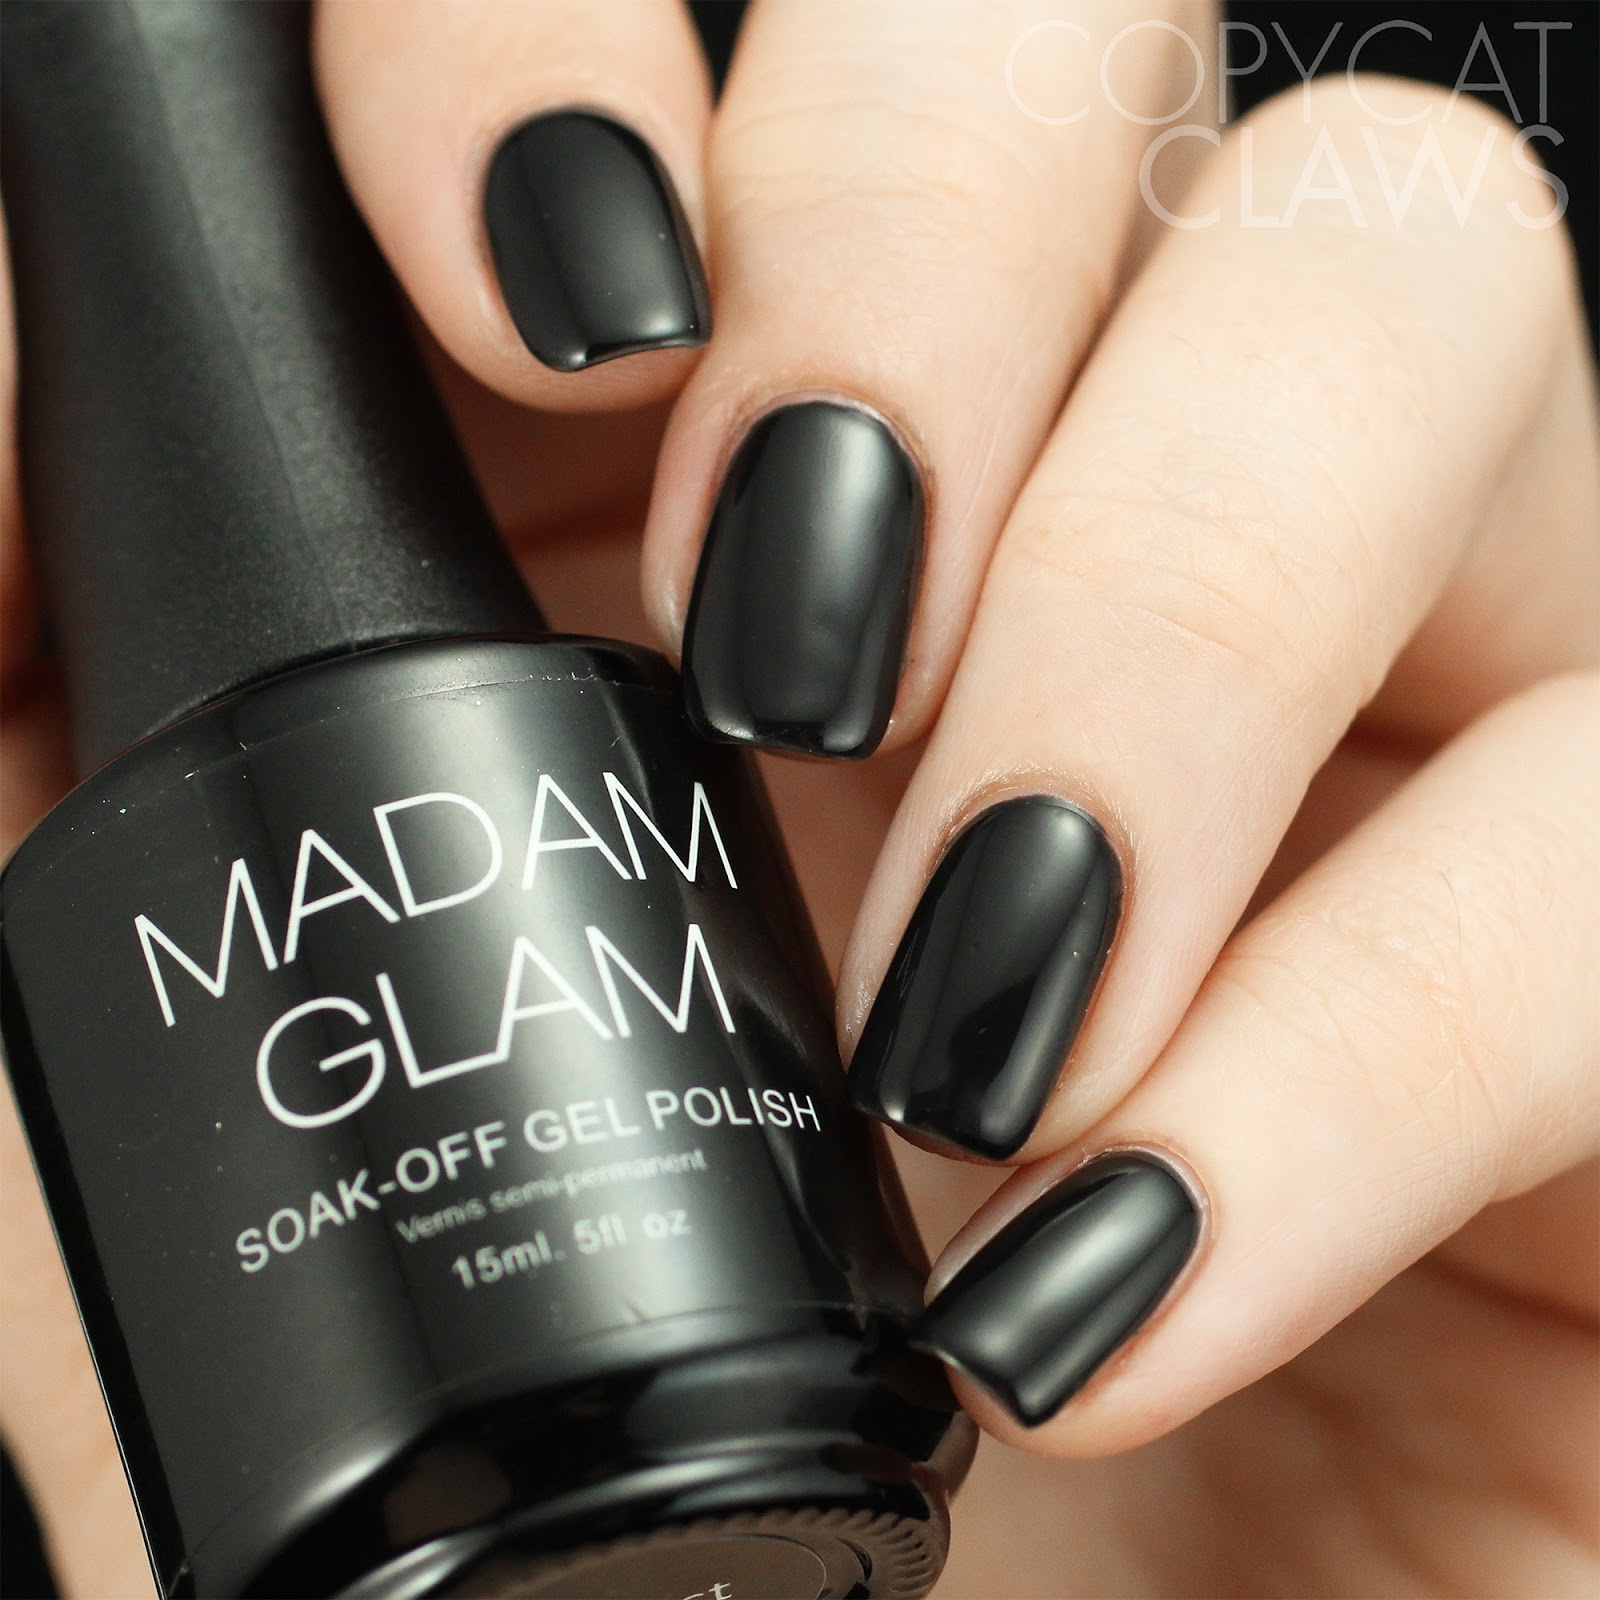 Copycat Claws: Madam Glam Gel Polish Review